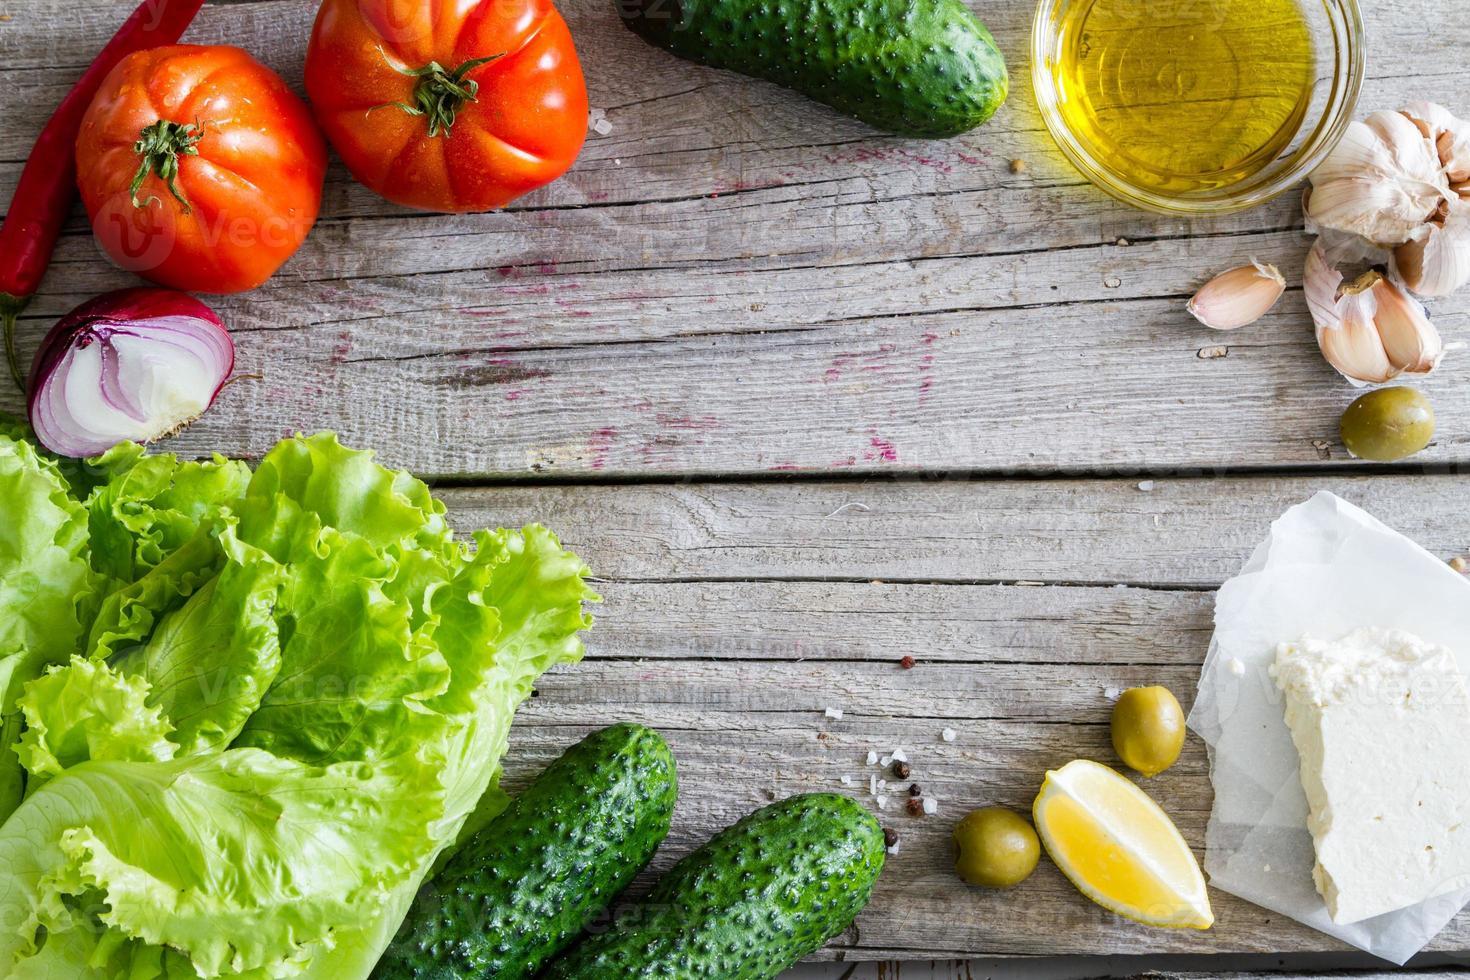 Greek salad ingredients - tomato, cucmber, salad, onion photo